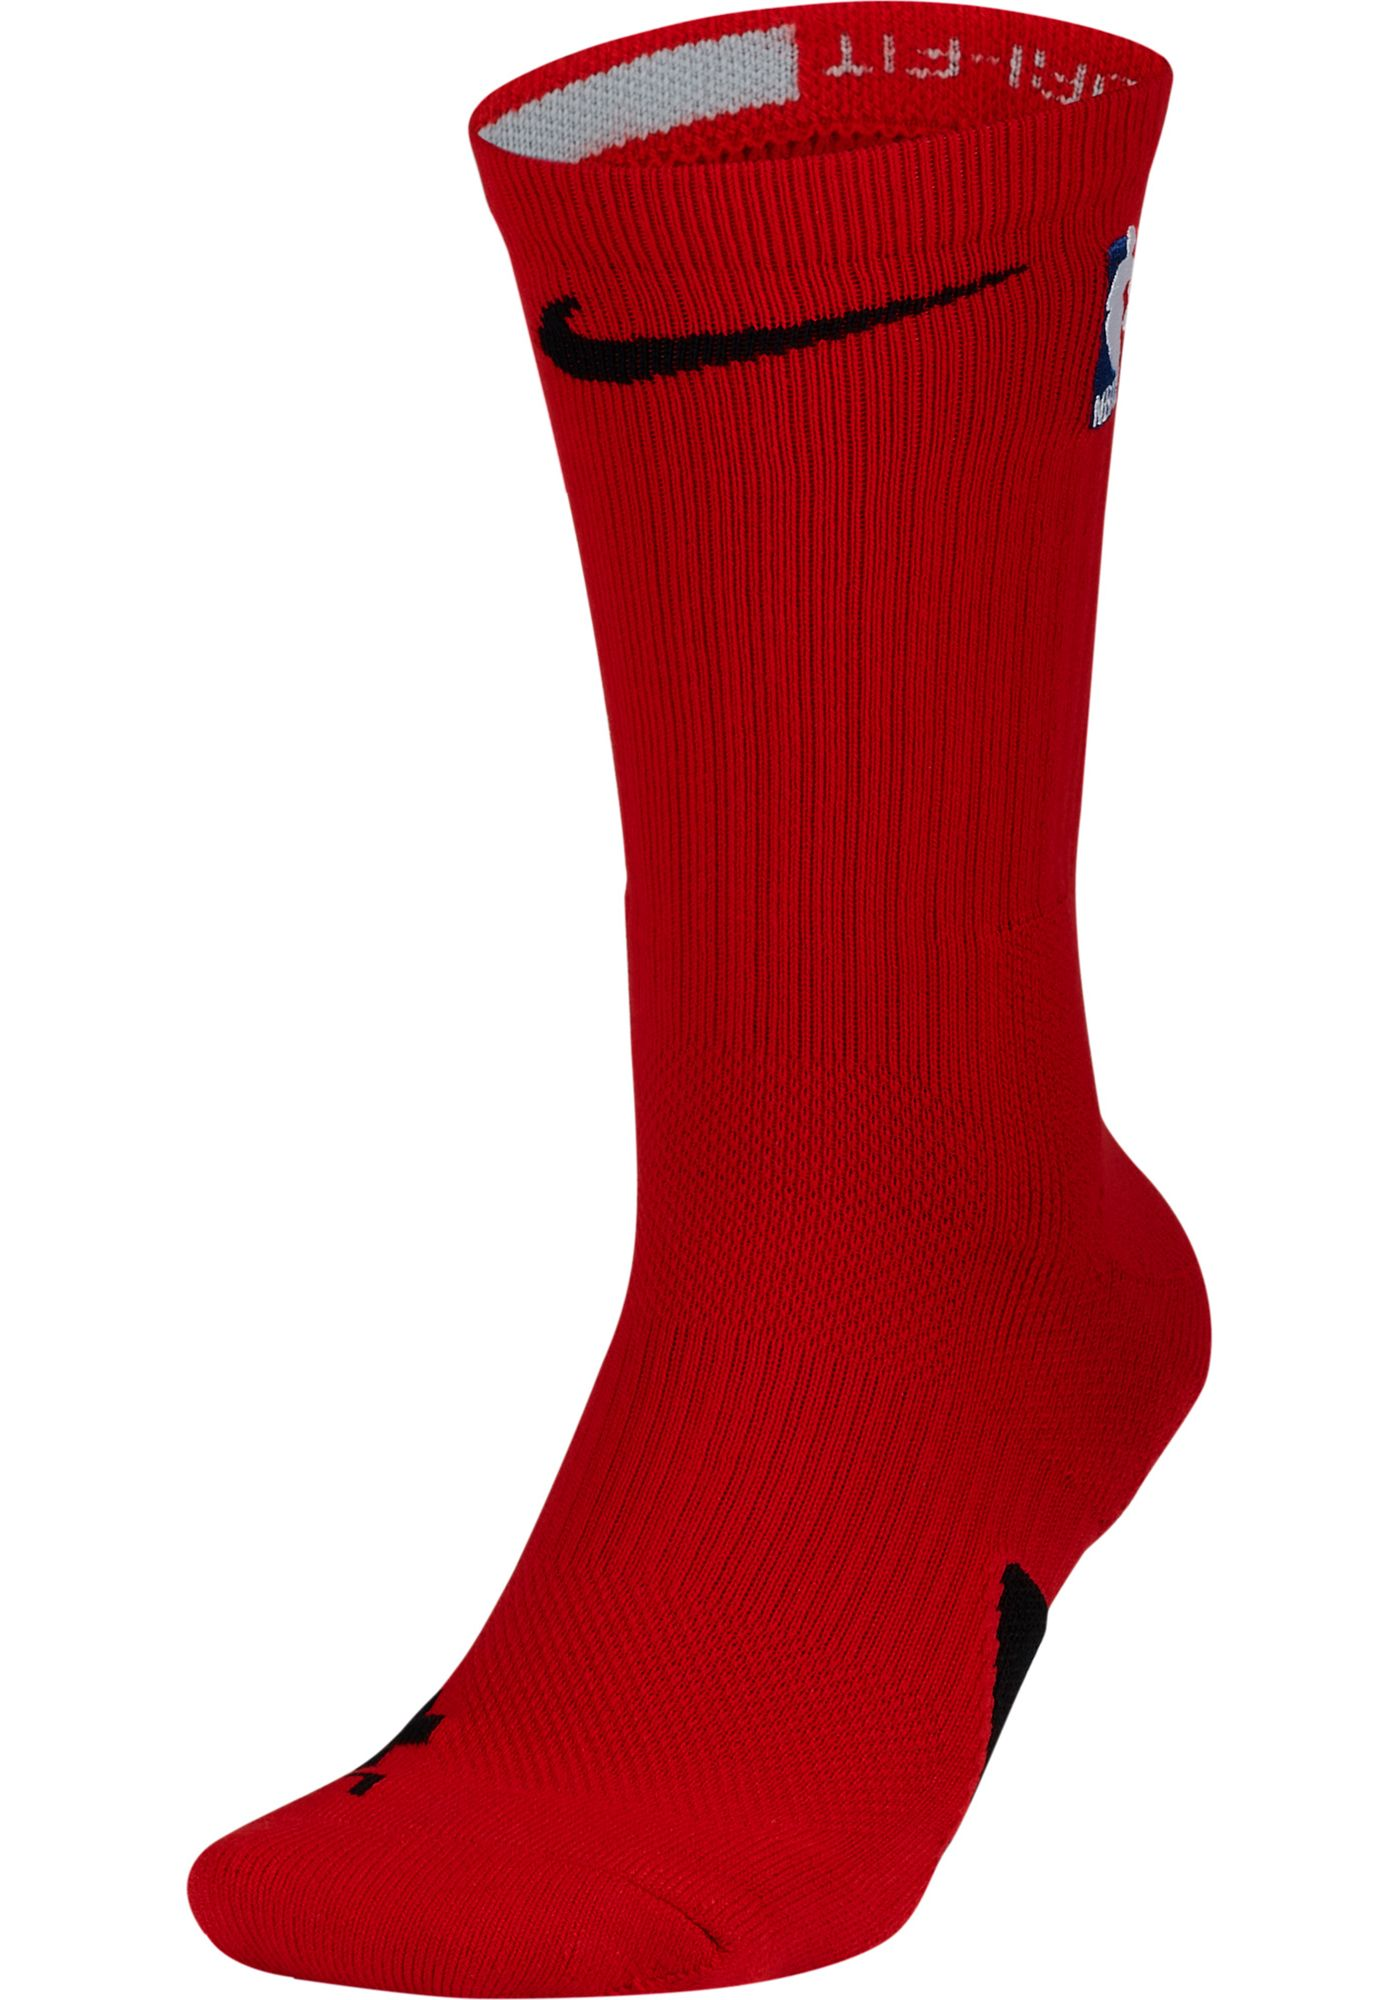 Nike NBA League Red Elite Crew Socks